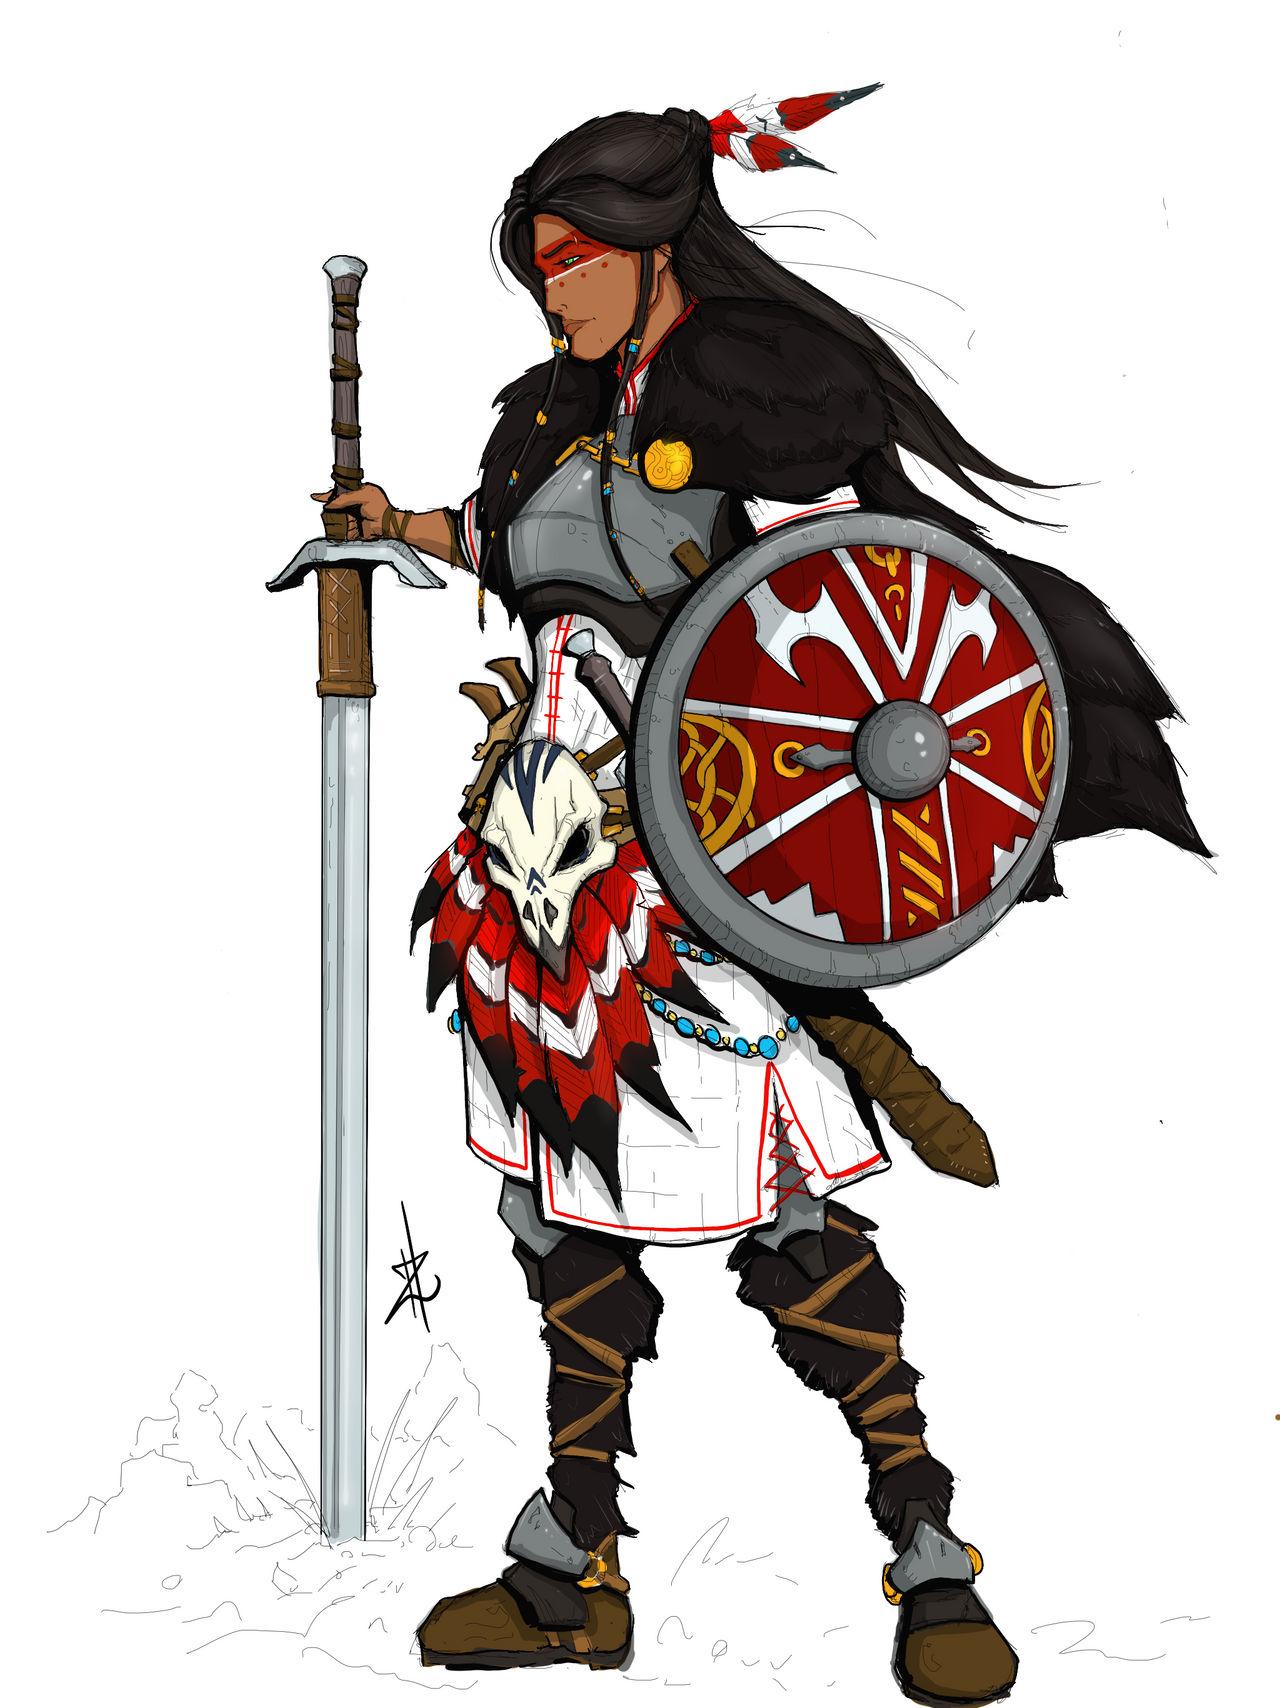 Norse-Native Warrior Woman